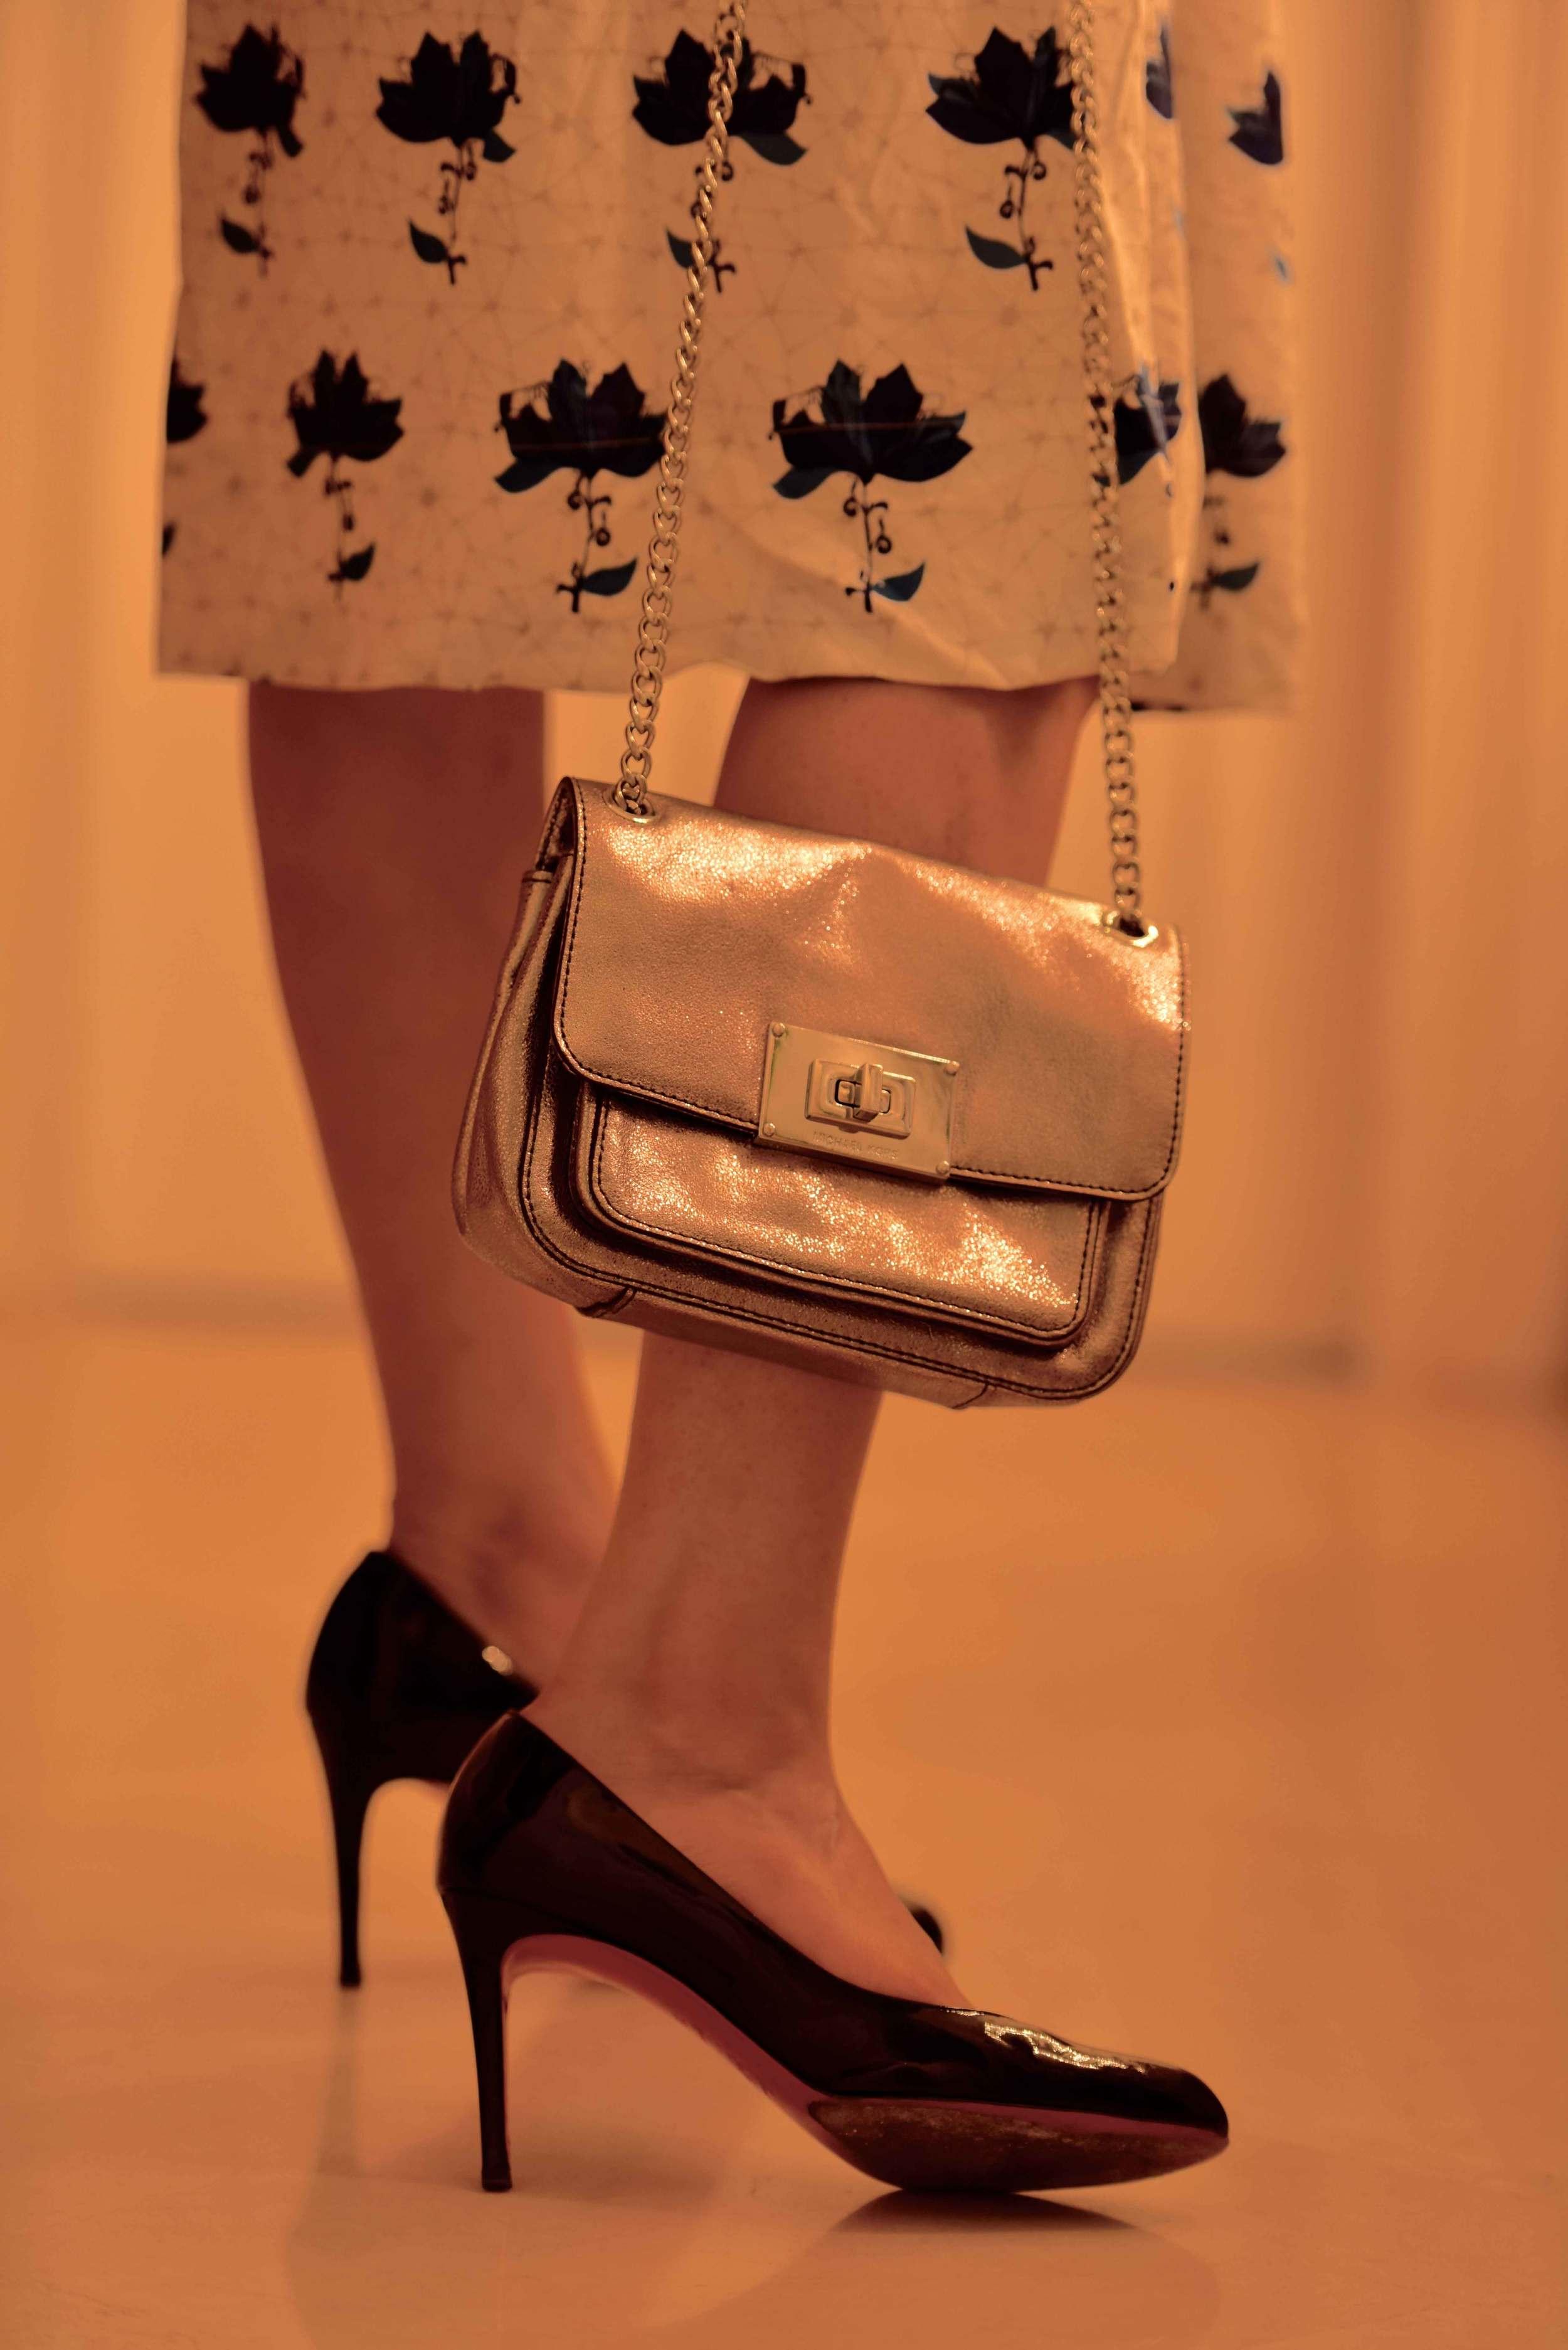 Ready for the red carpet! Bag: Michael Kors, Shoes: Loubitons. Image©gunjanvirk